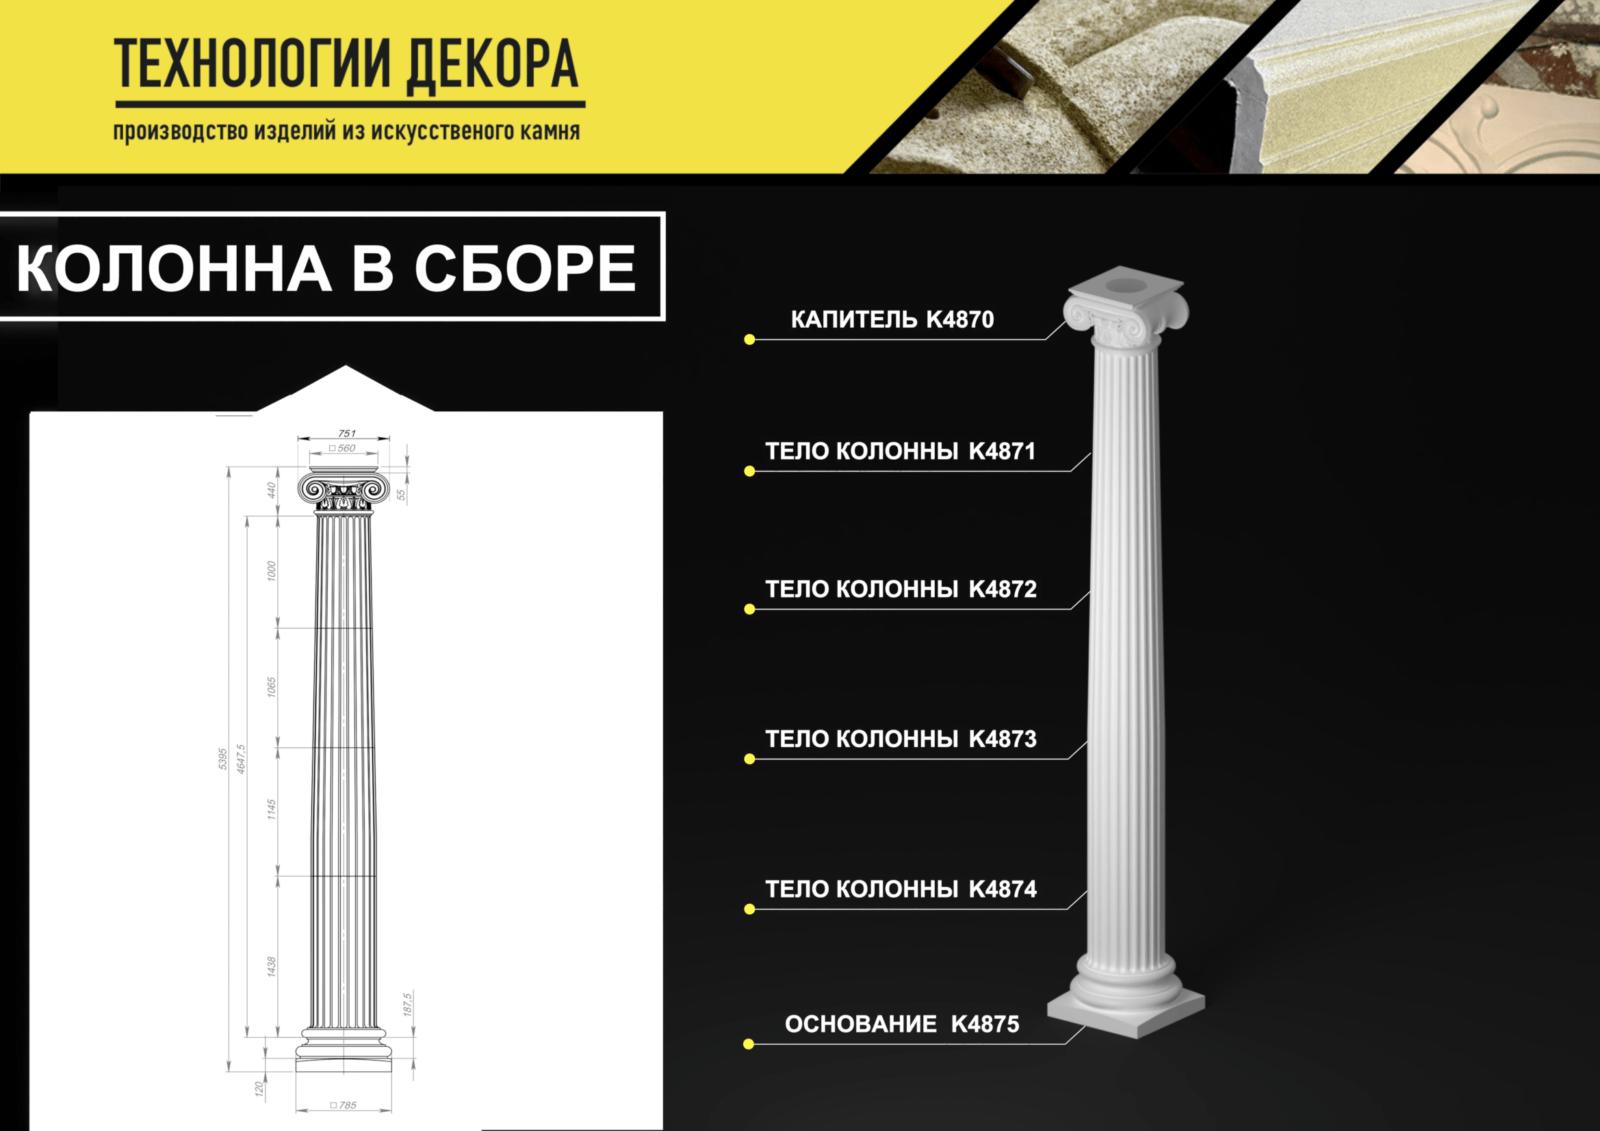 Монтаж колонны из архикамня и стеклофибробетона.